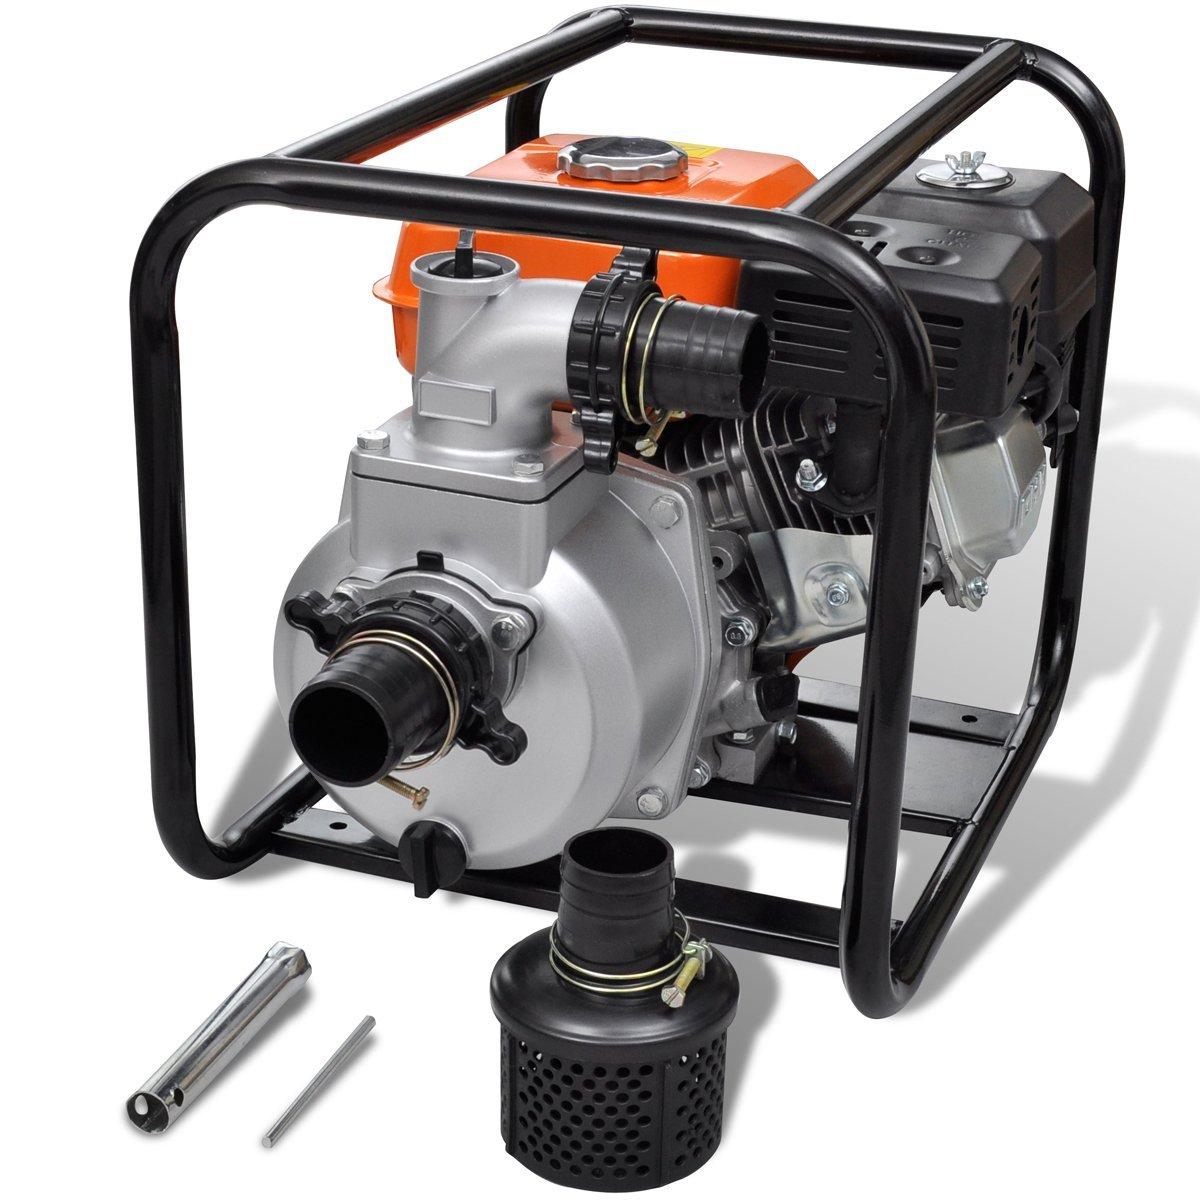 vidaXL Petrol Engine Water Pump 80mm Connection 6.5HP Irrigation Application